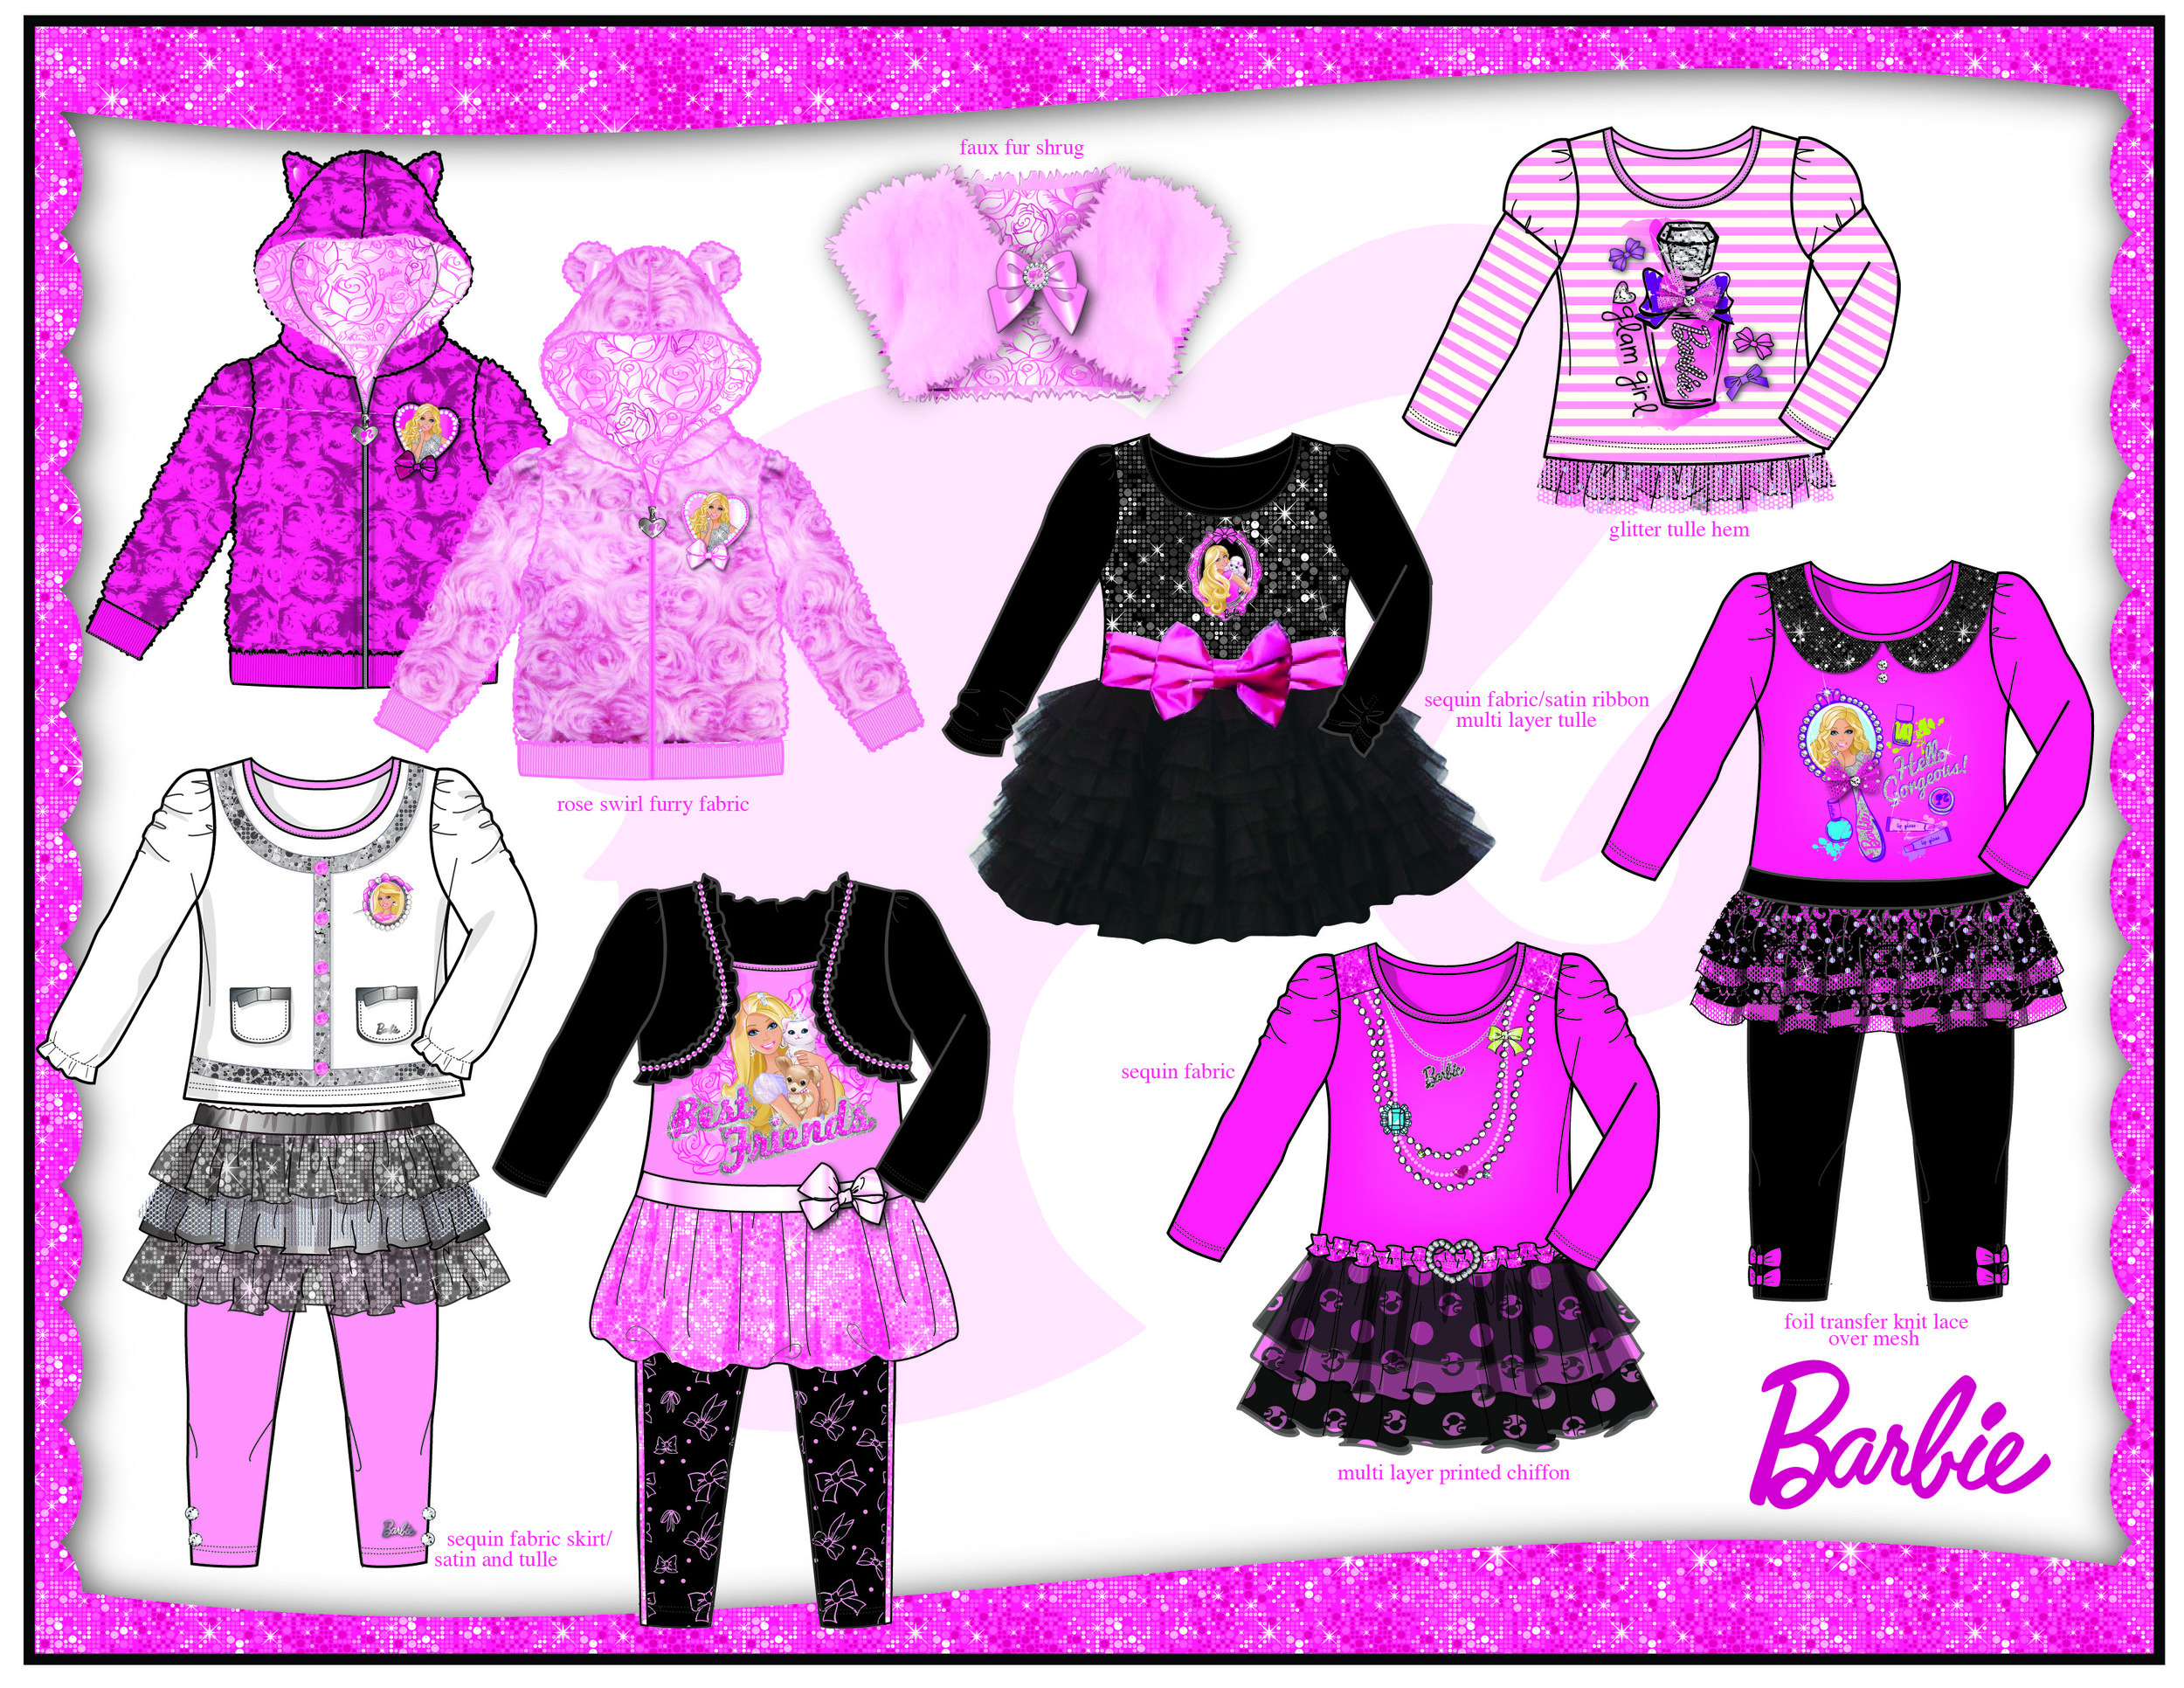 Bentex. Barbie. Bling Line Sheet Page 1.